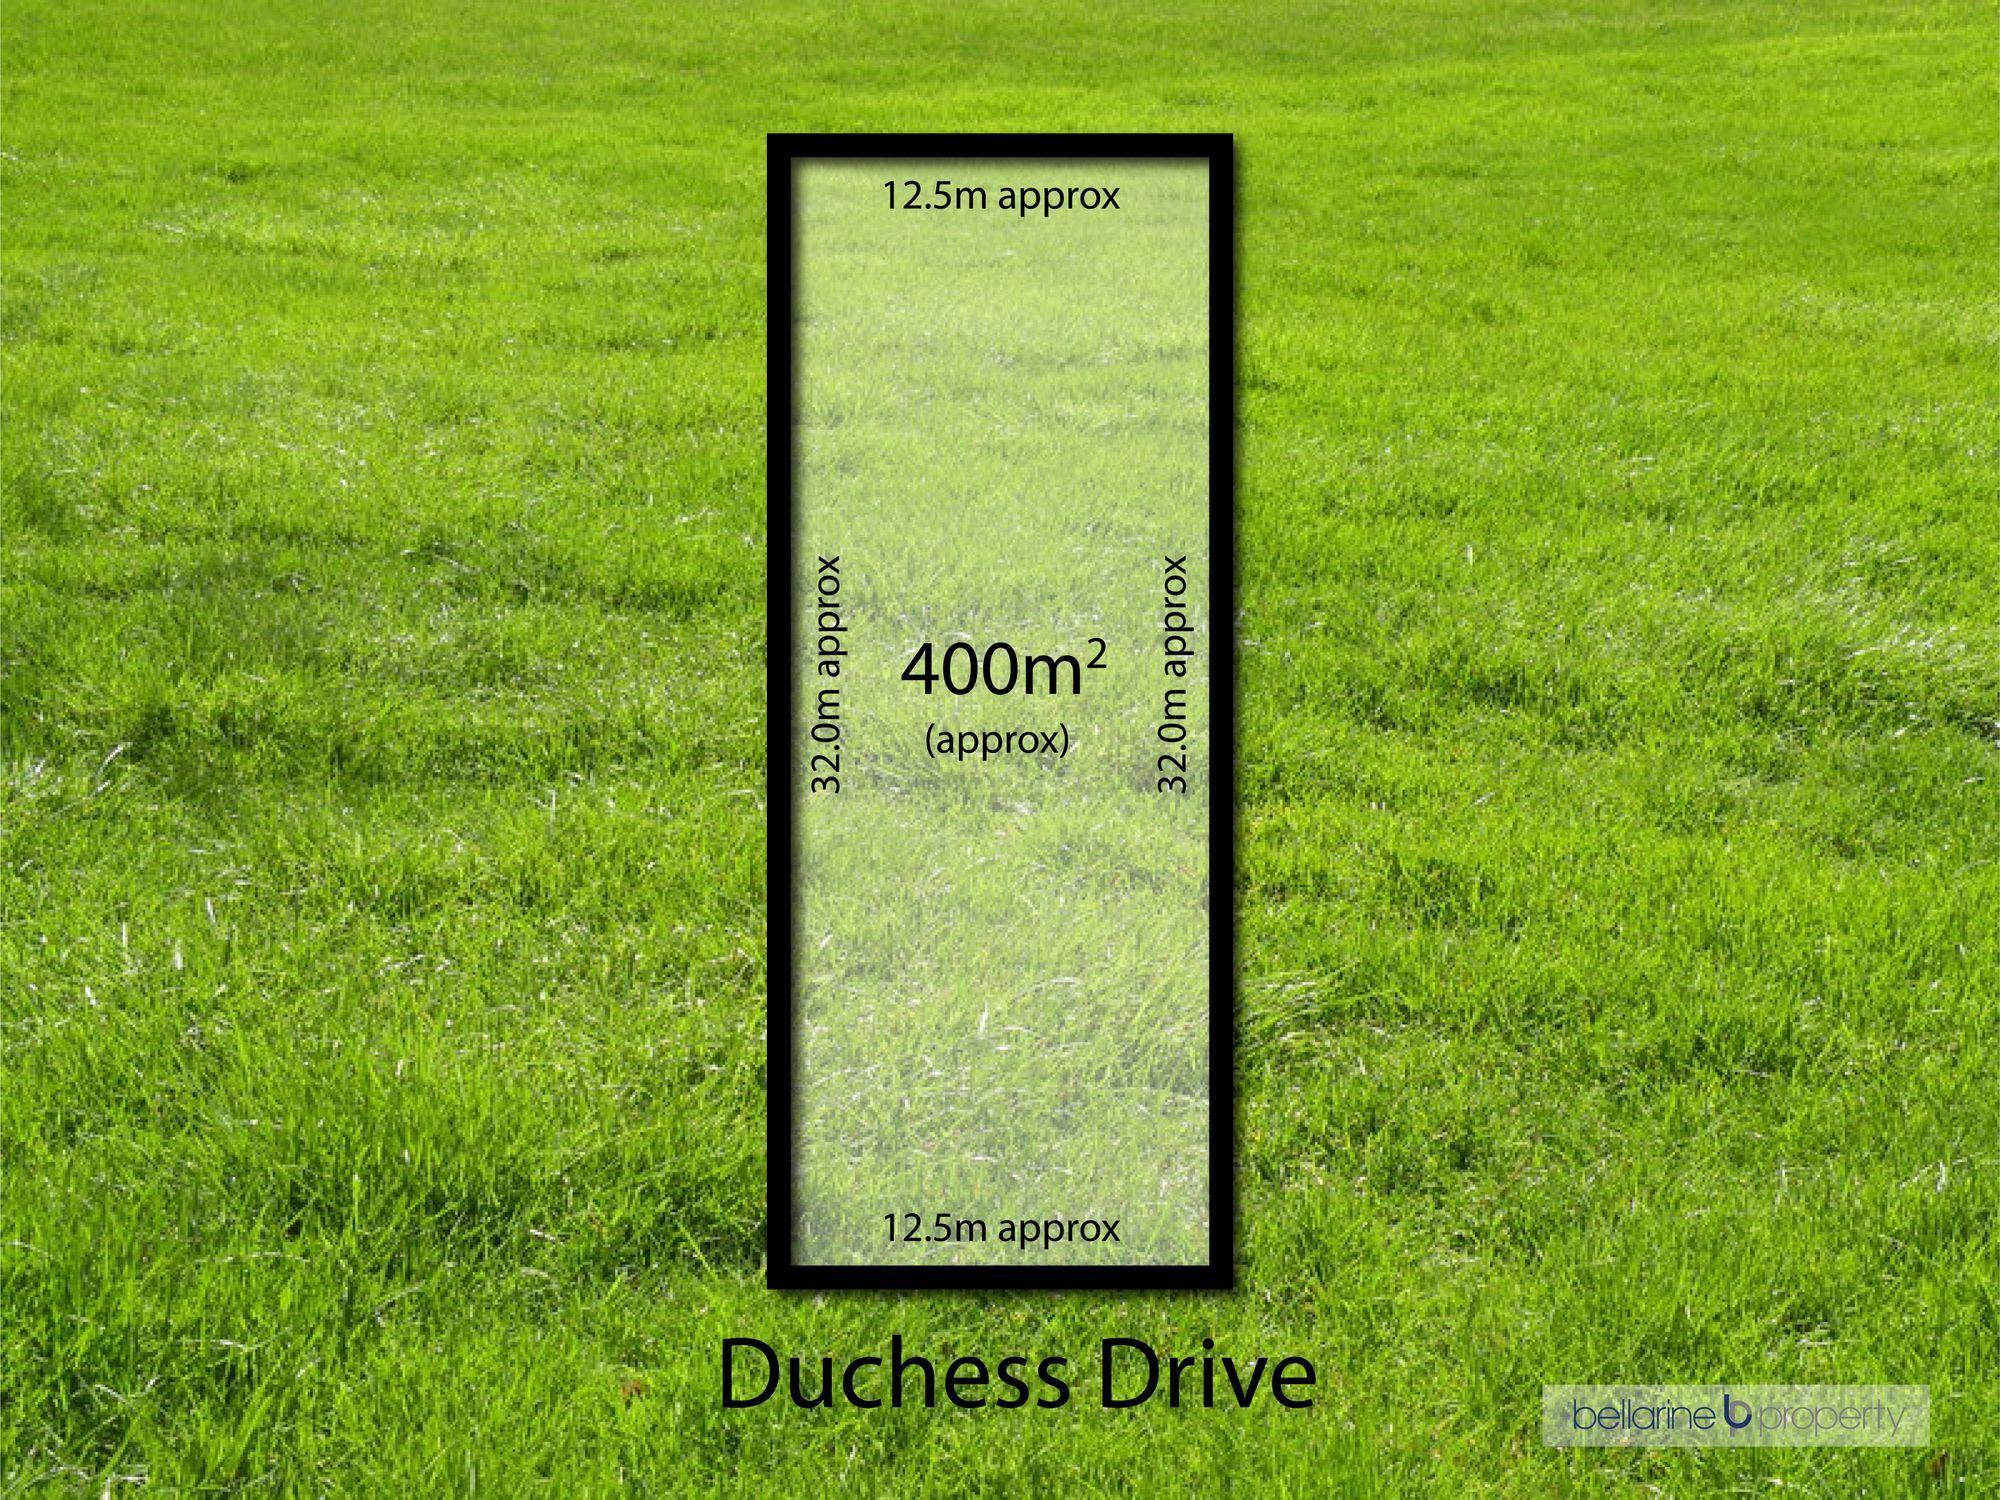 68 Duchess Drive, St Leonards VIC 3223